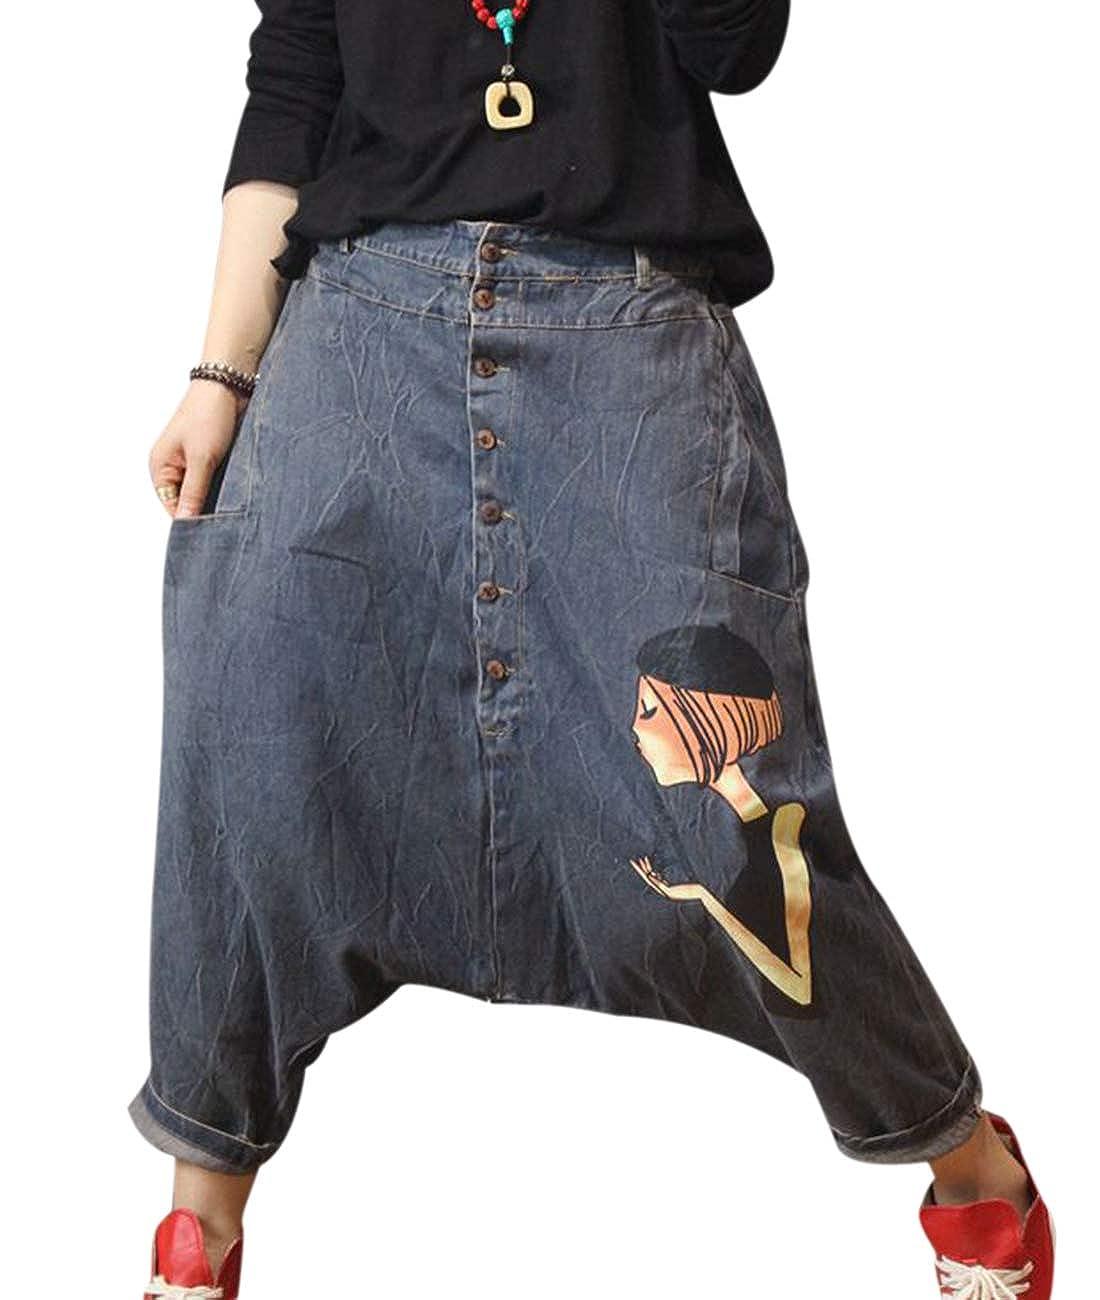 Pdp bluee Yesno J68 Womens 100% Cotton Wide Leg 9' Jeans Pants Casual Loose Fit Elastic Waist